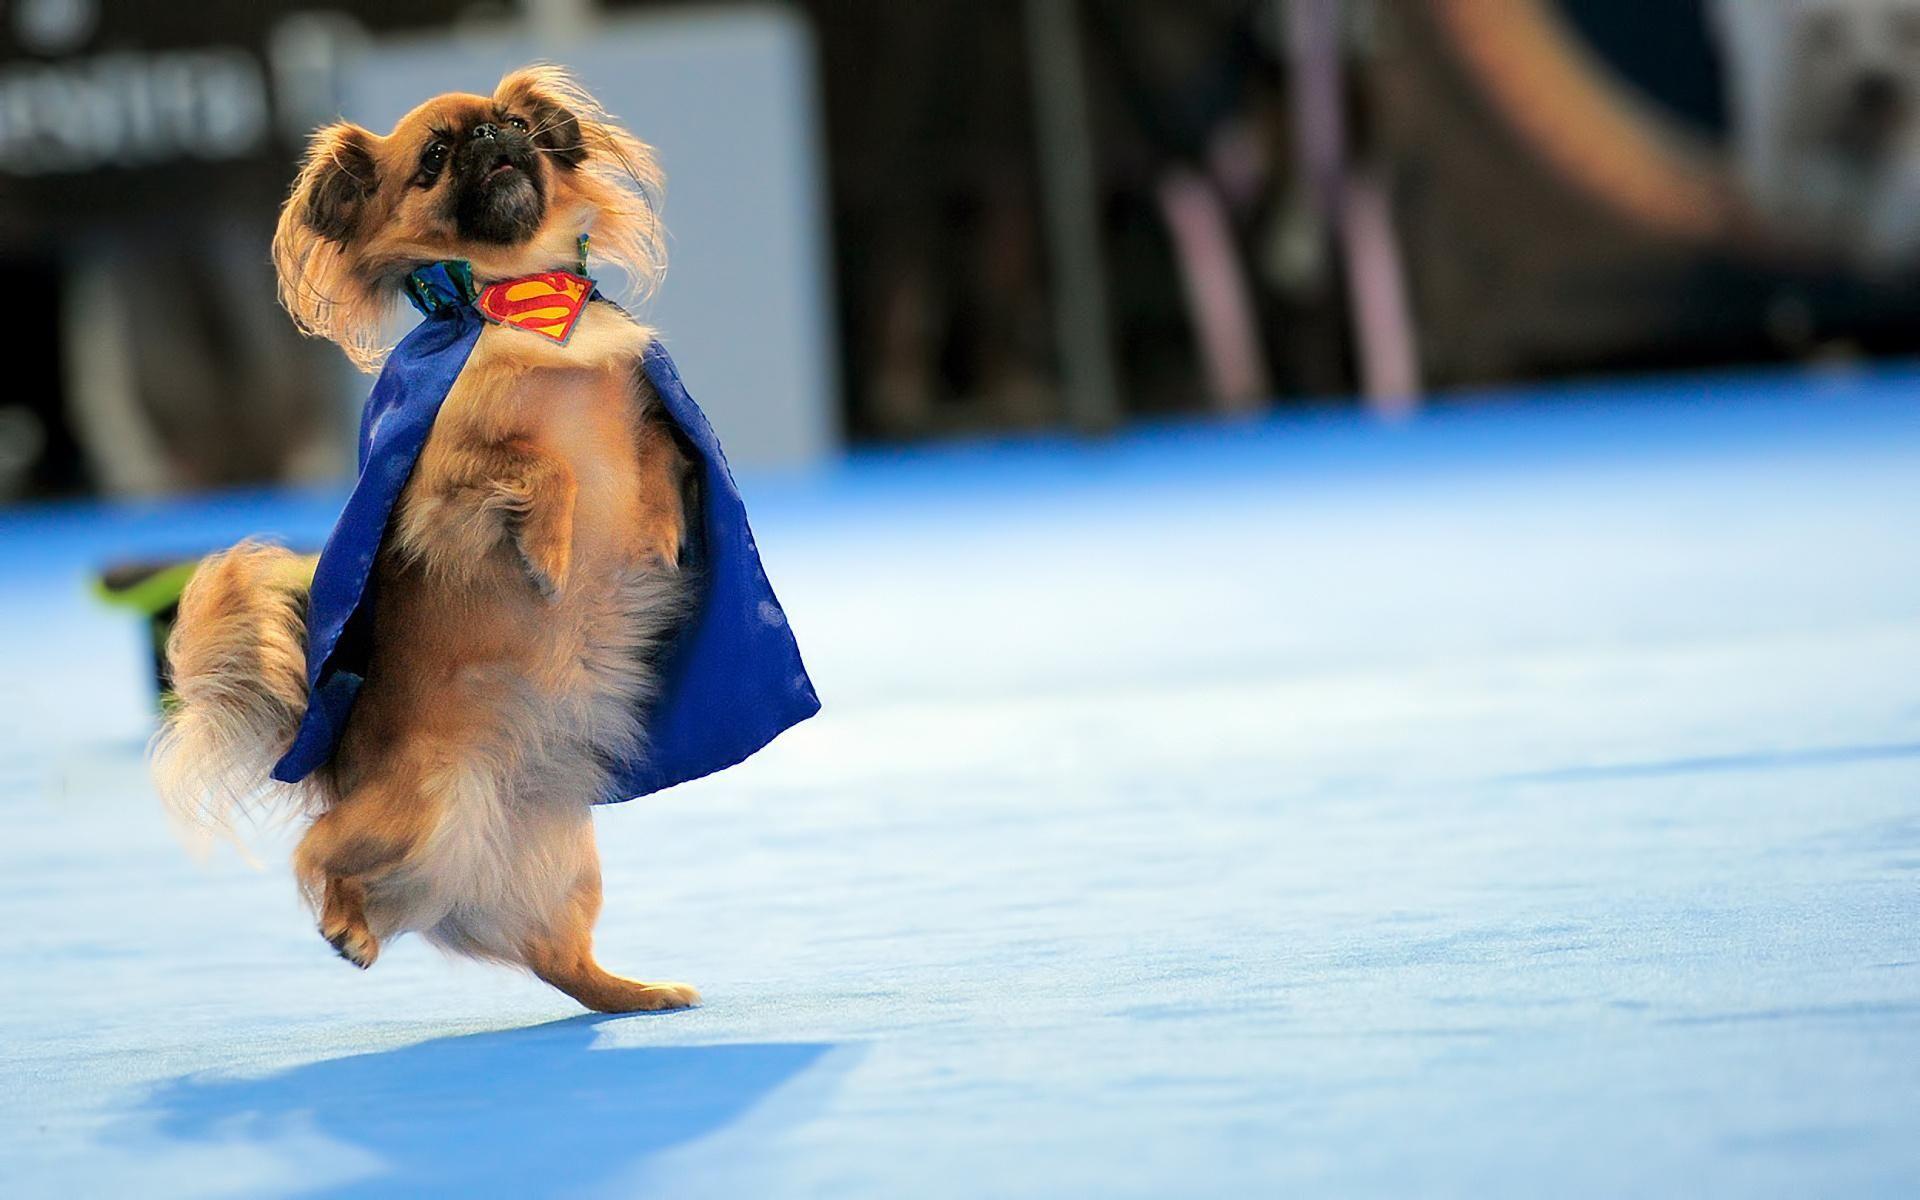 funny pics Funny Dog Superman Logo HDWallpaper Funny